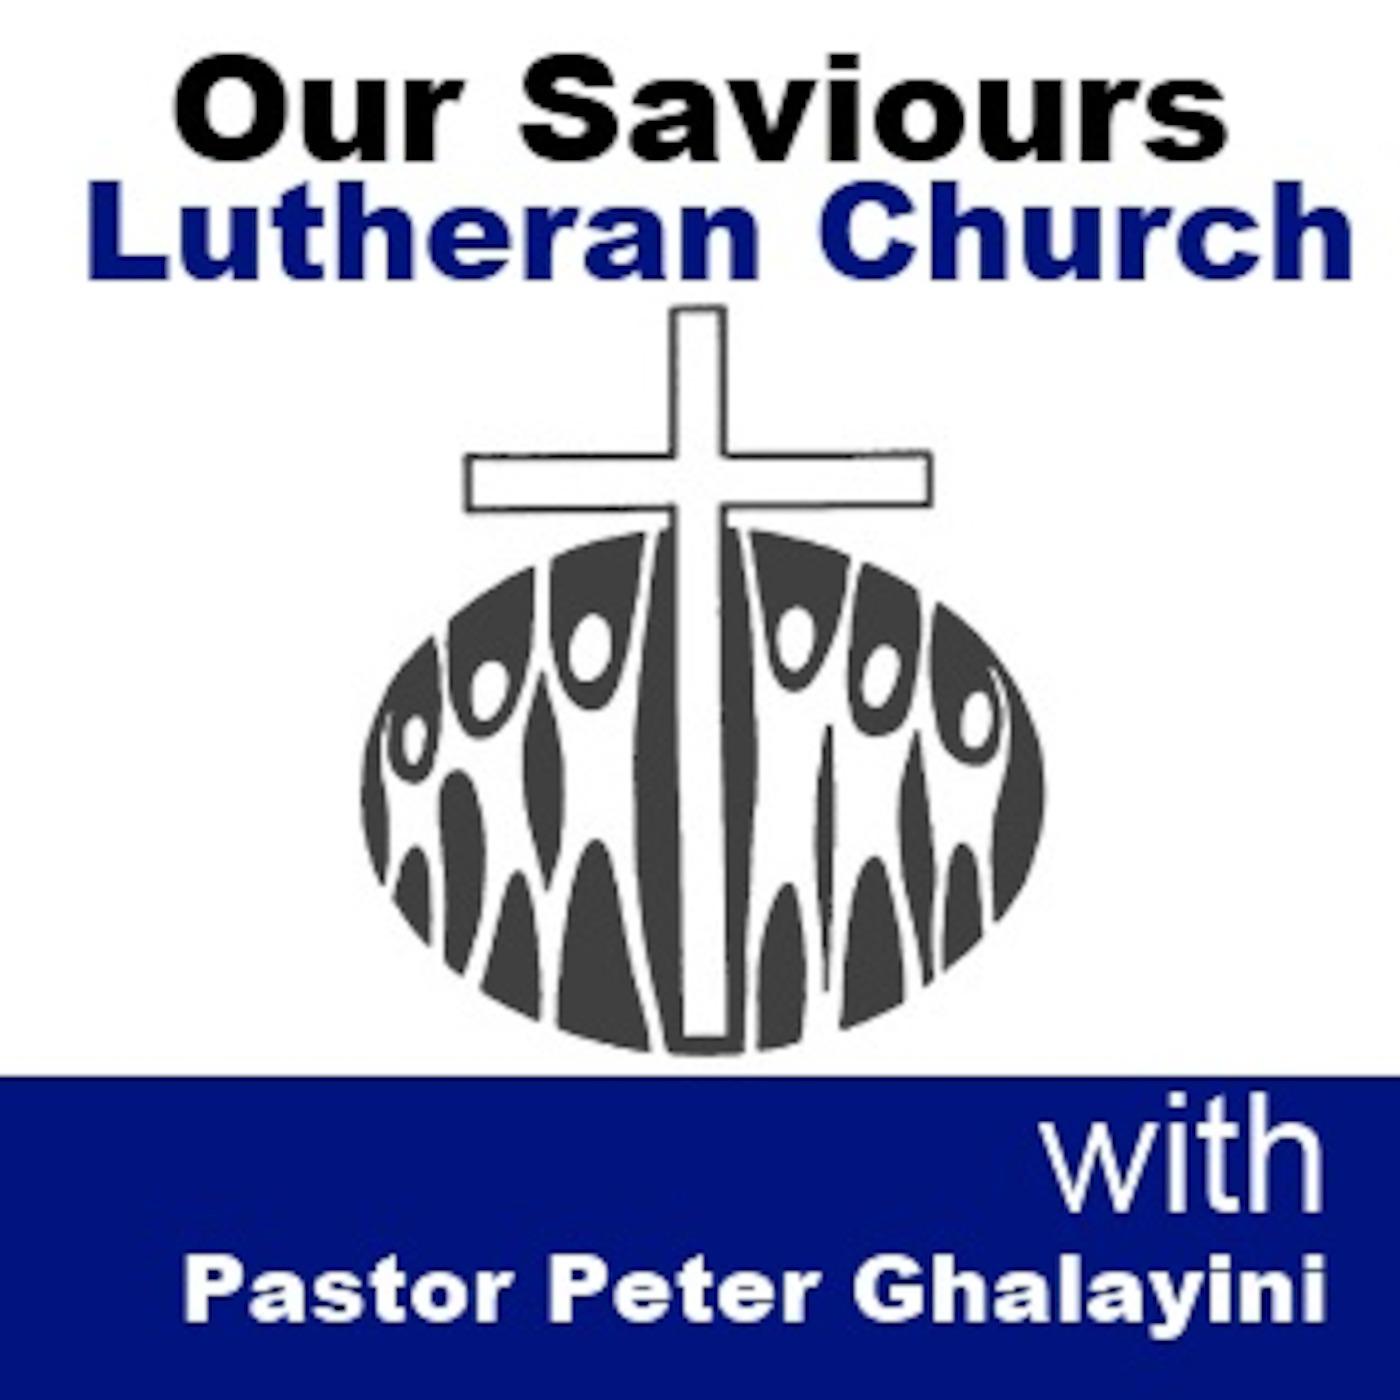 Our Saviour's Lutheran Church, Knox, Victoria, Australia